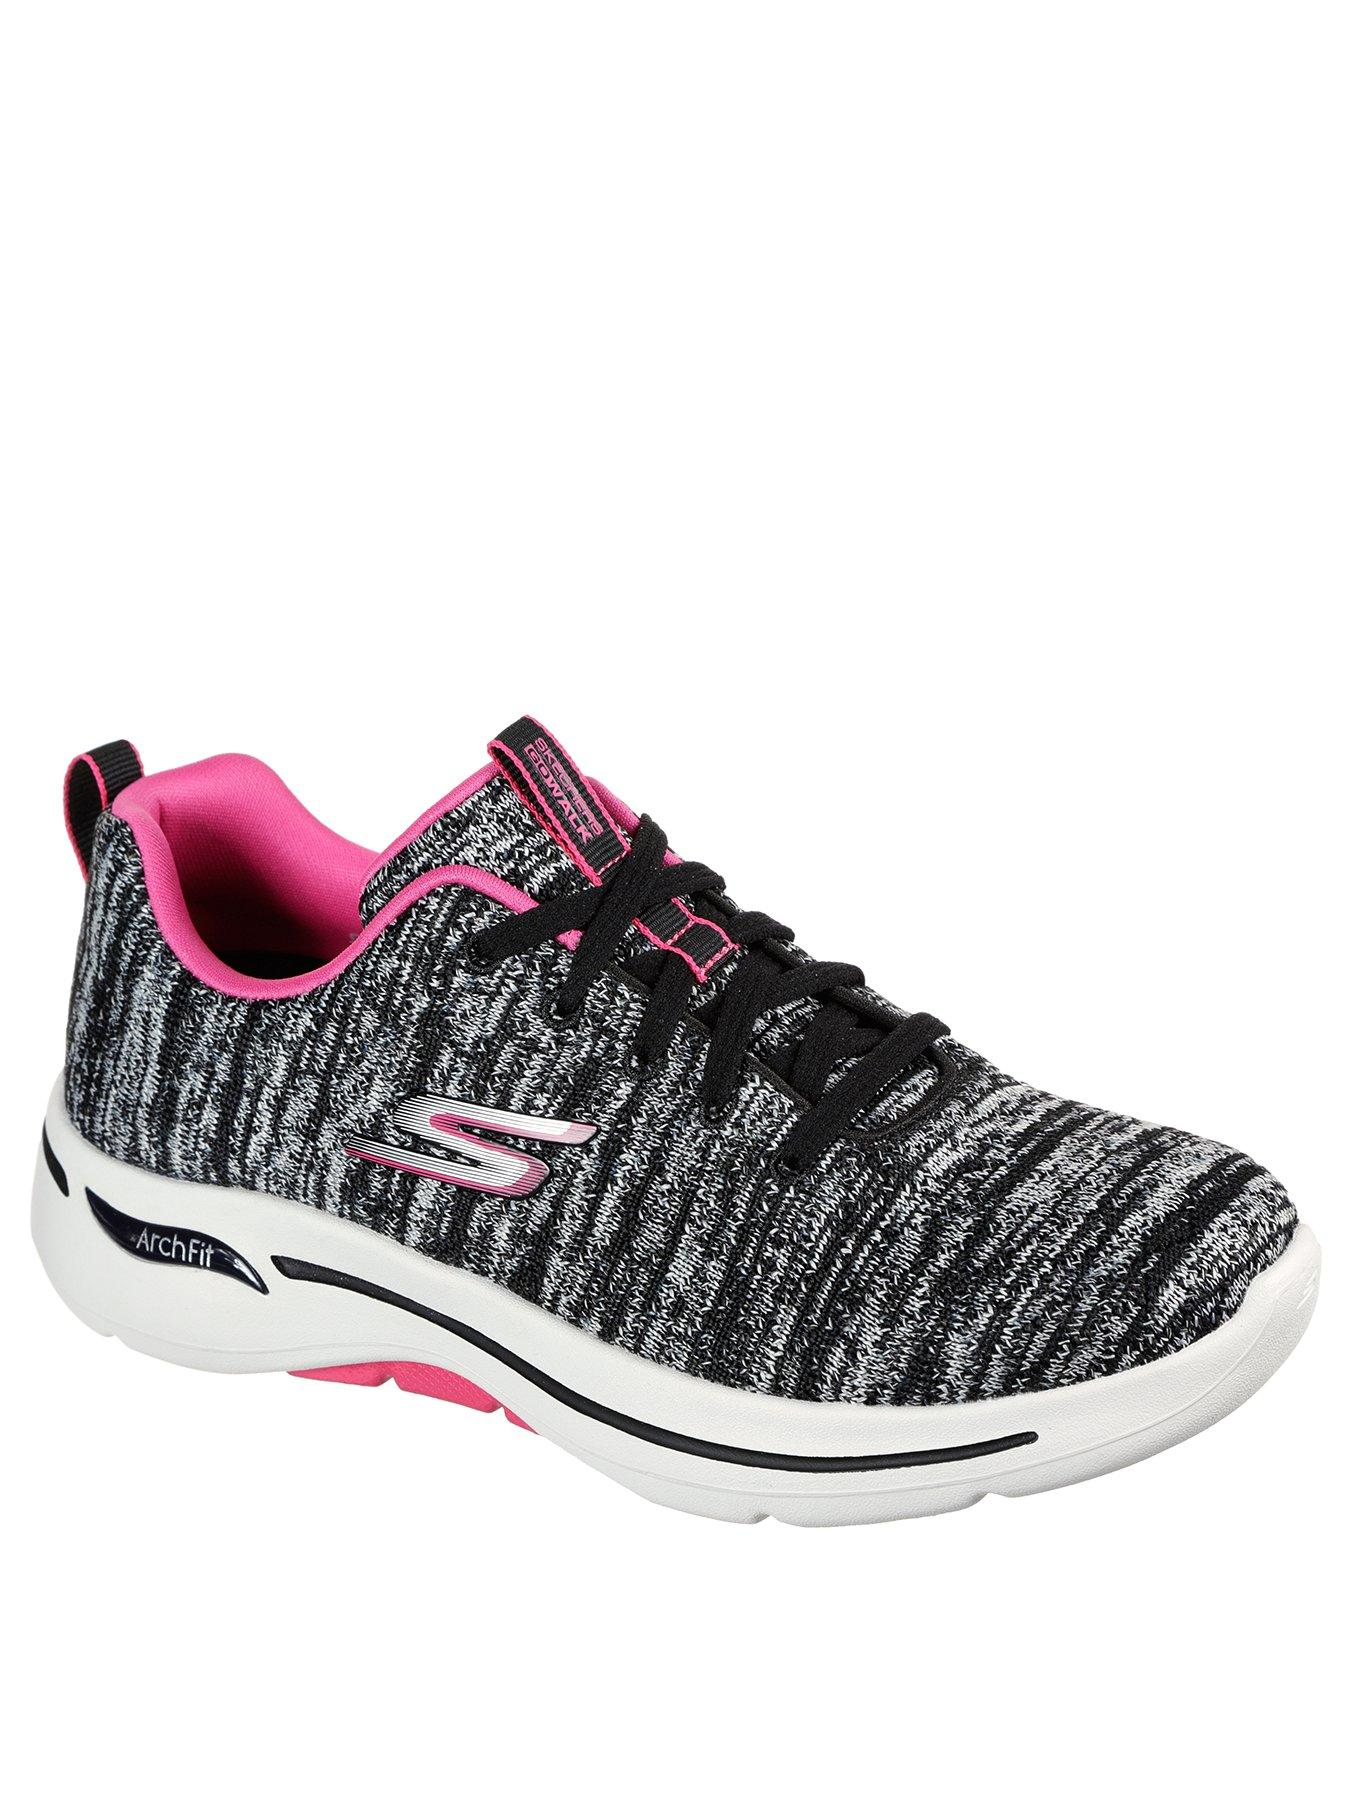 Skechers | Shoes \u0026 boots | Women